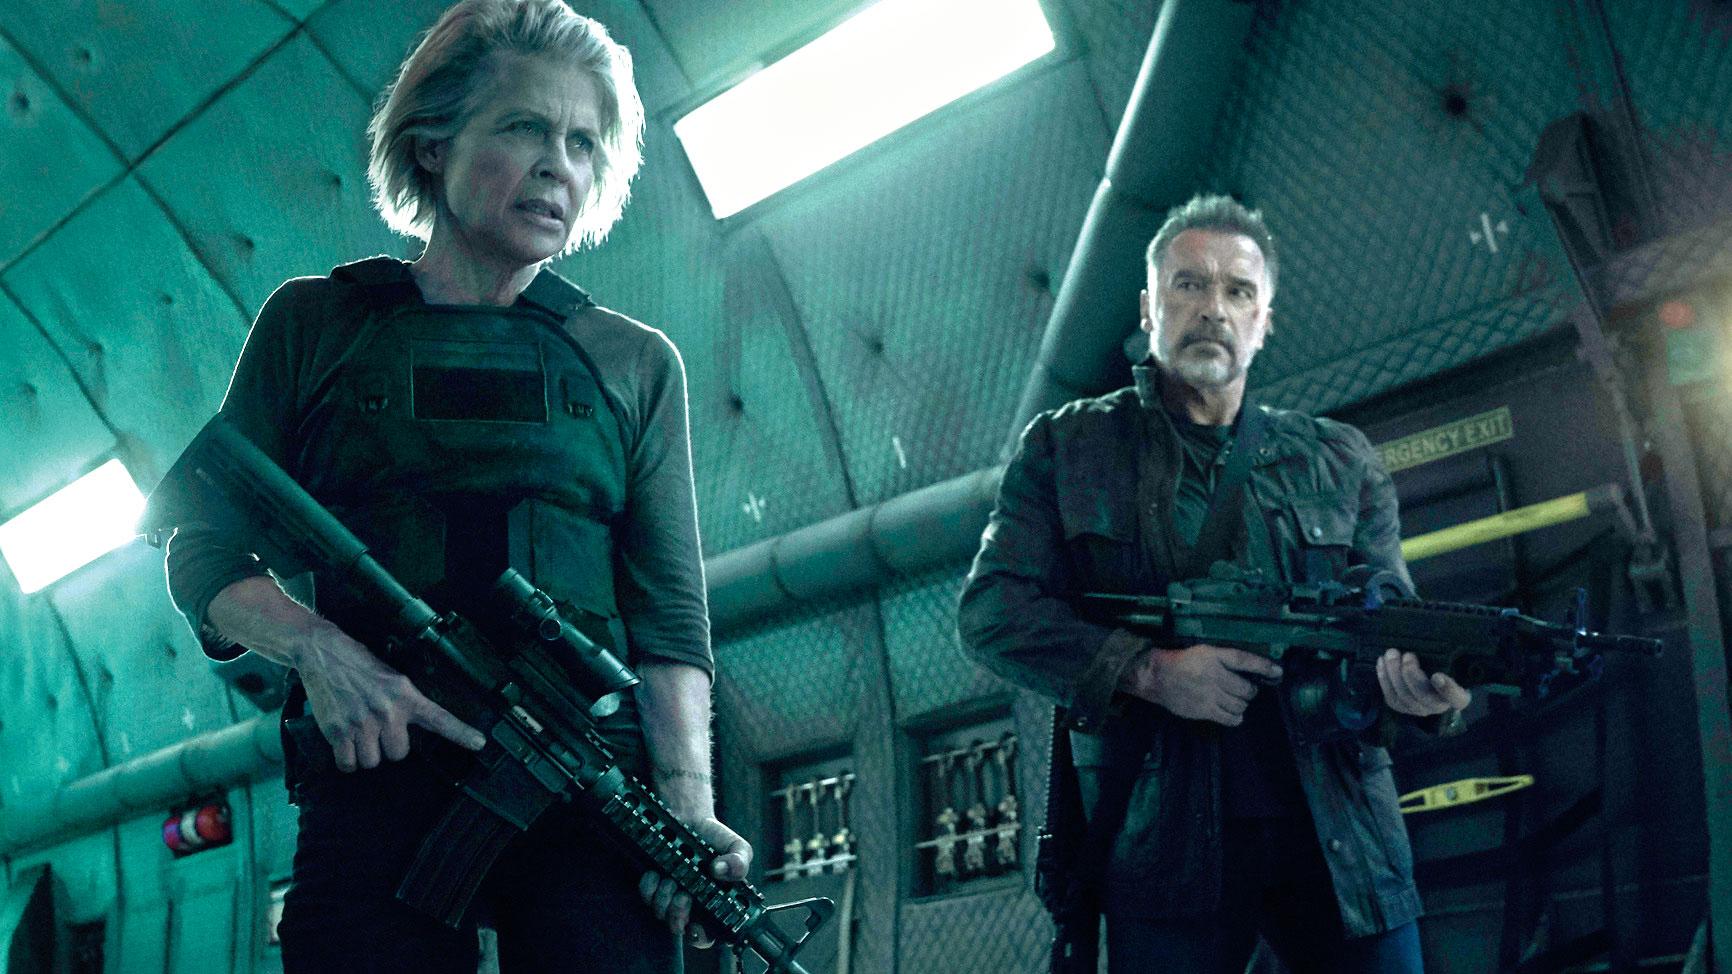 Linda Hamilton and Arnold Schwarzenegger in Terminator: Dark Fate.